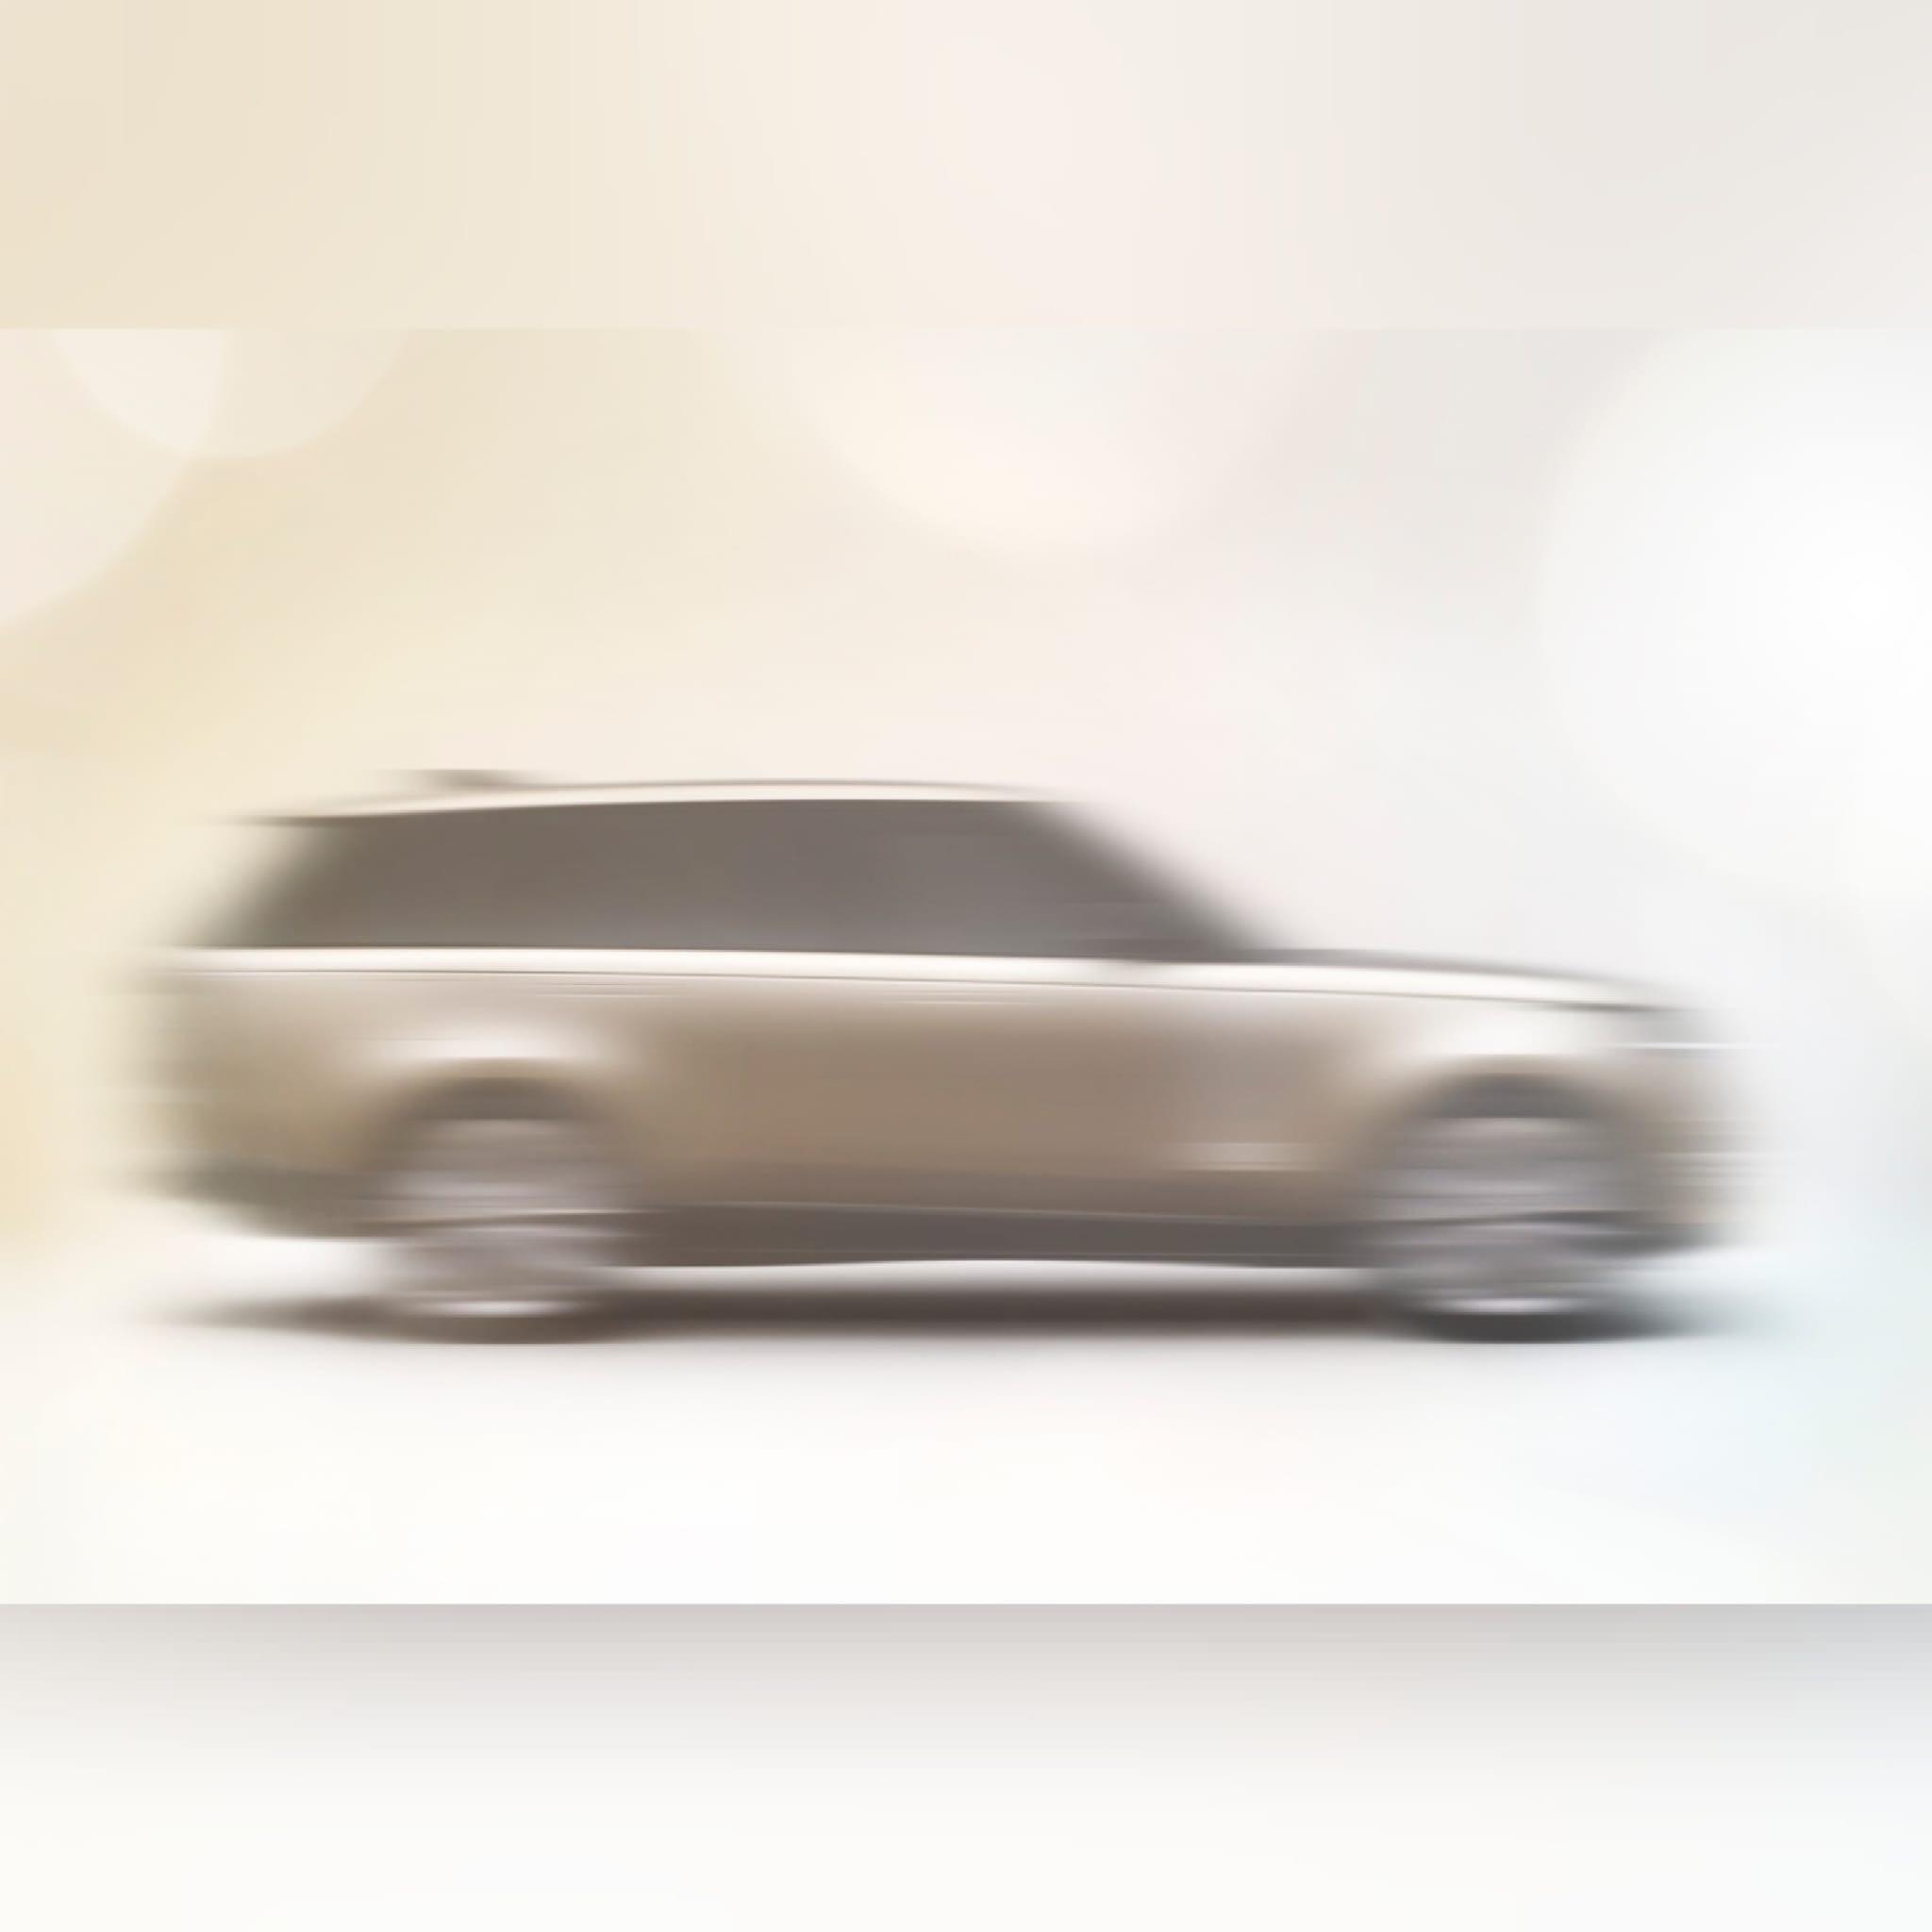 Range Rover via range Rover for use by 360 Magazine